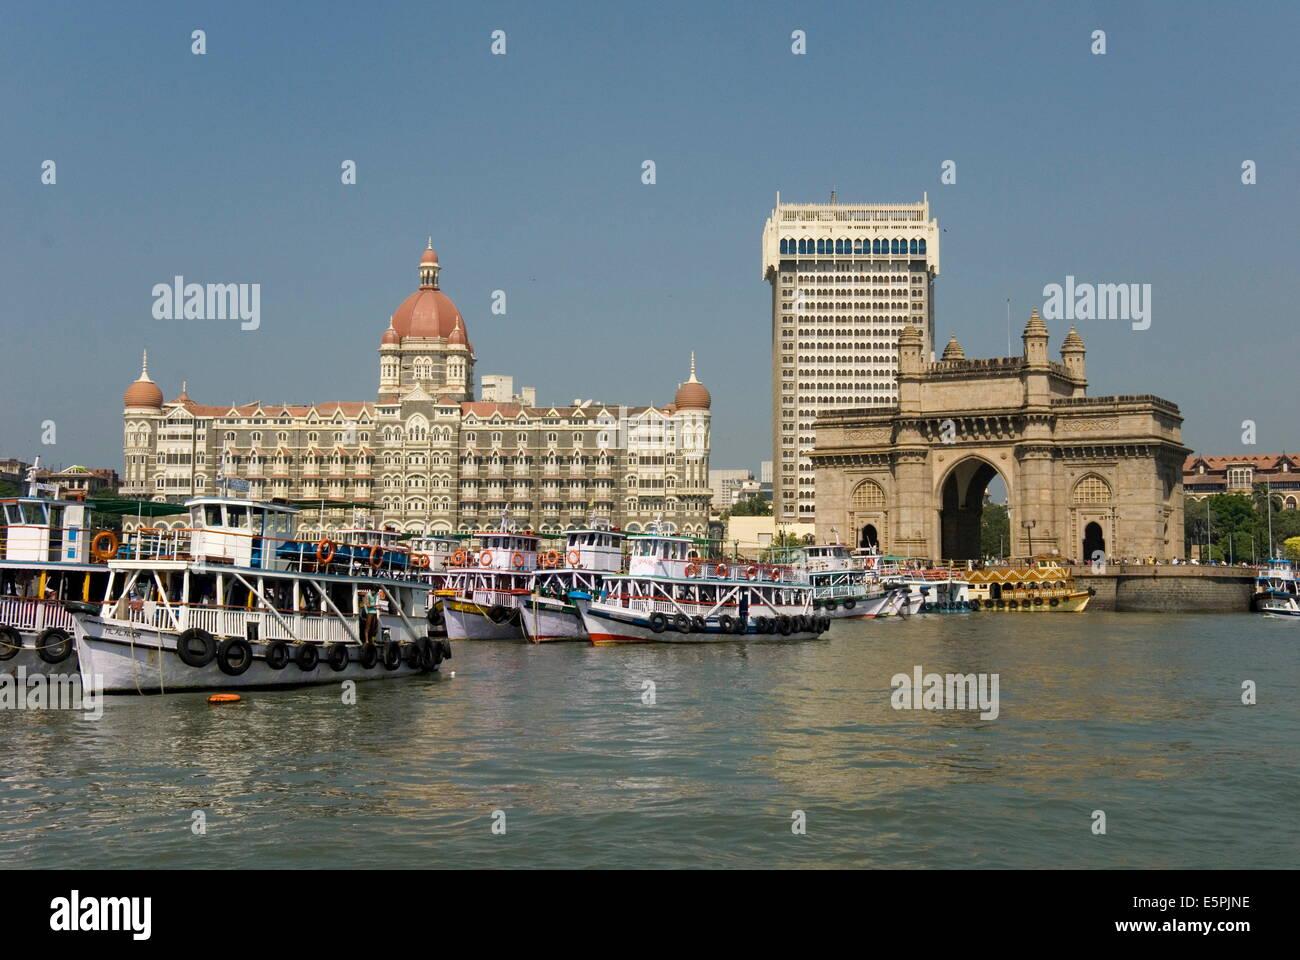 Gateway of India on the dockside beside the Taj Mahal Hotel, Mumbai, India, Asia - Stock Image